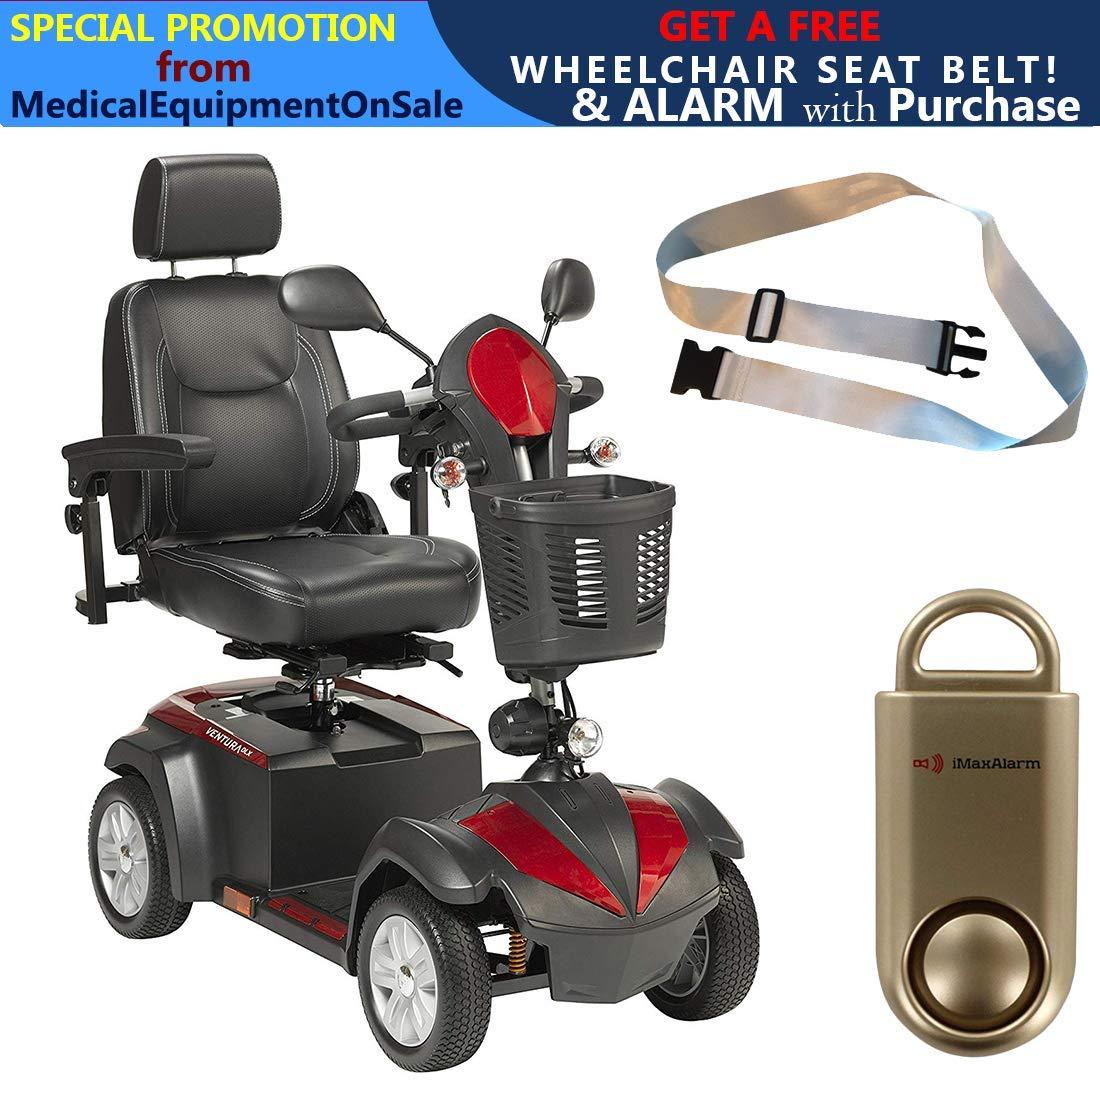 Amazon.com: Ventura Power - Patinete de 4 ruedas, asiento de ...